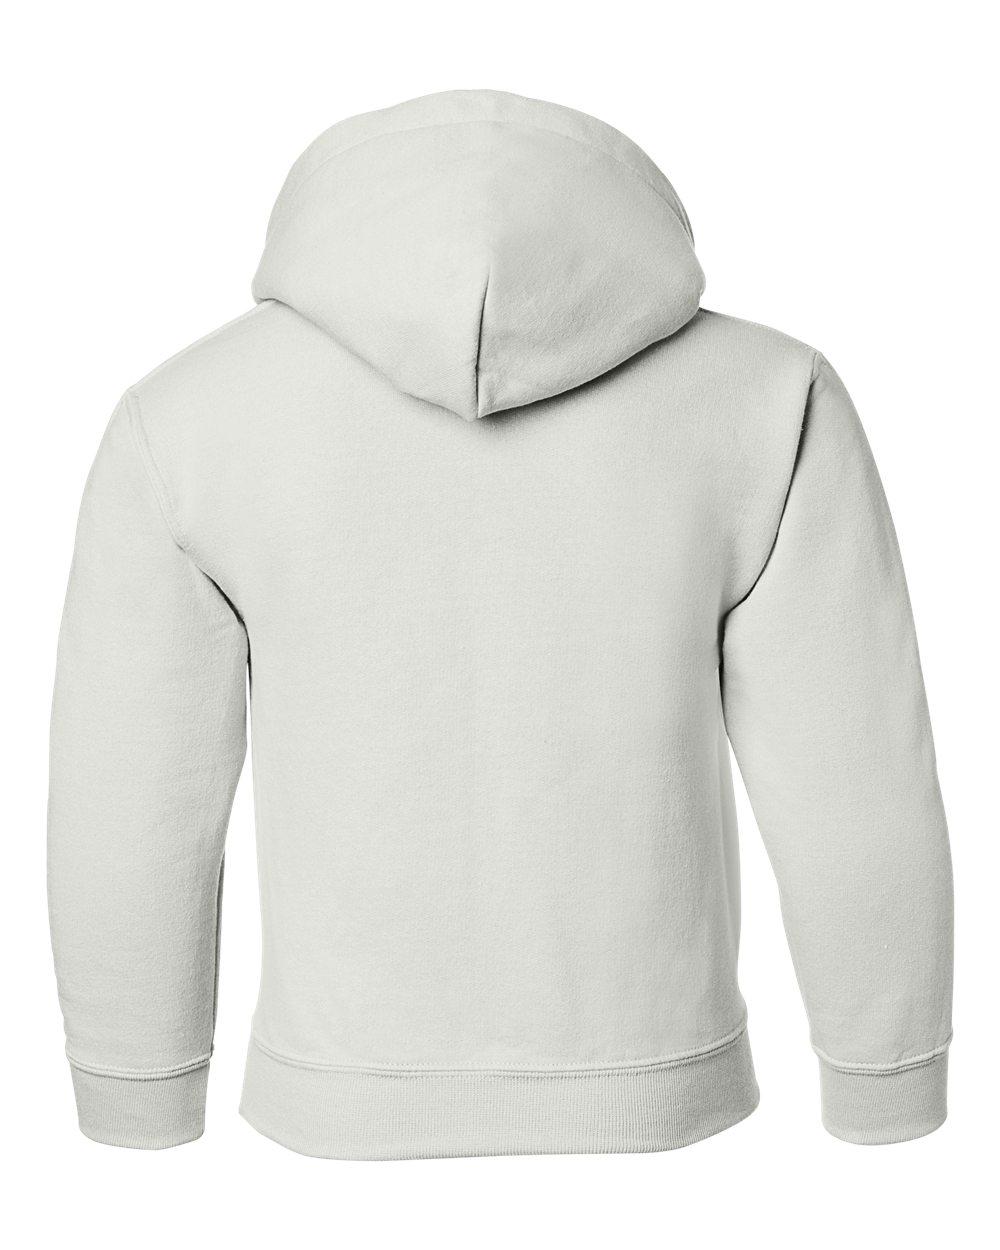 Gildan Boys Heavy Blend Hooded Sweatshirt -Graphite Heather-L G185B